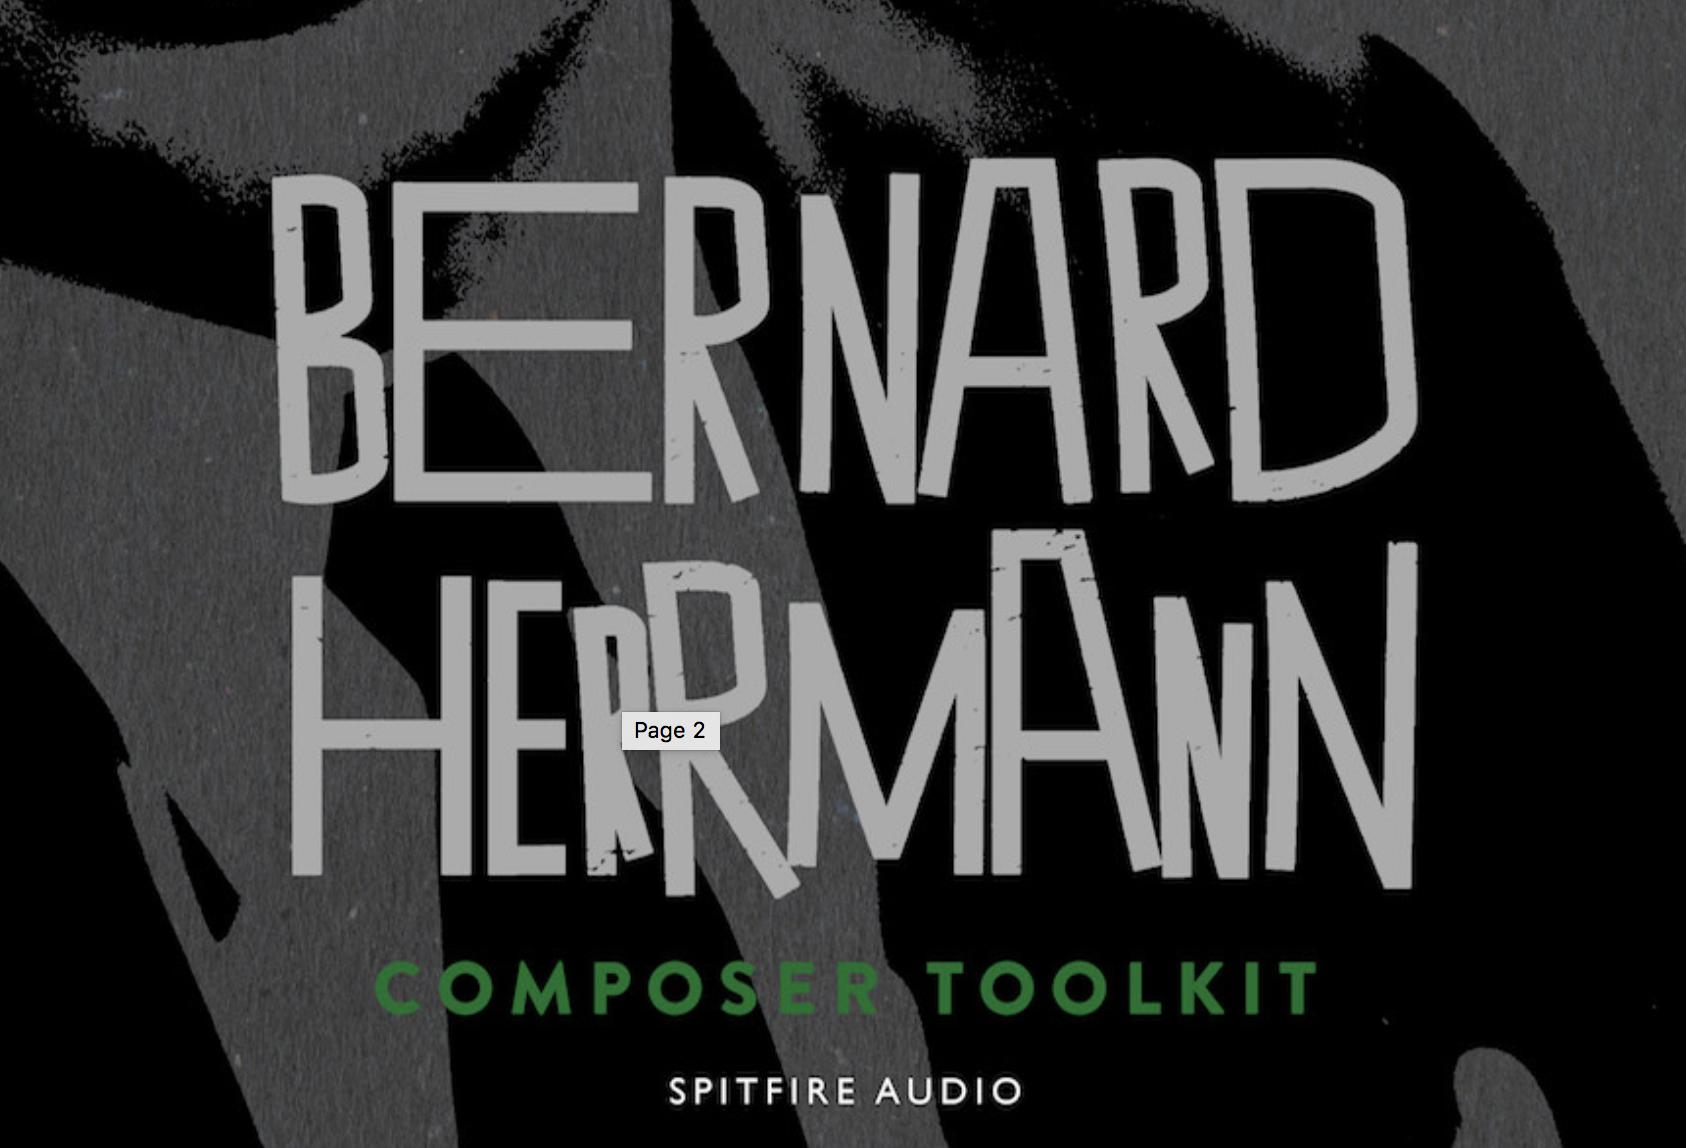 Spitfire Bernard Herrmann Composer Toolkit - Everything